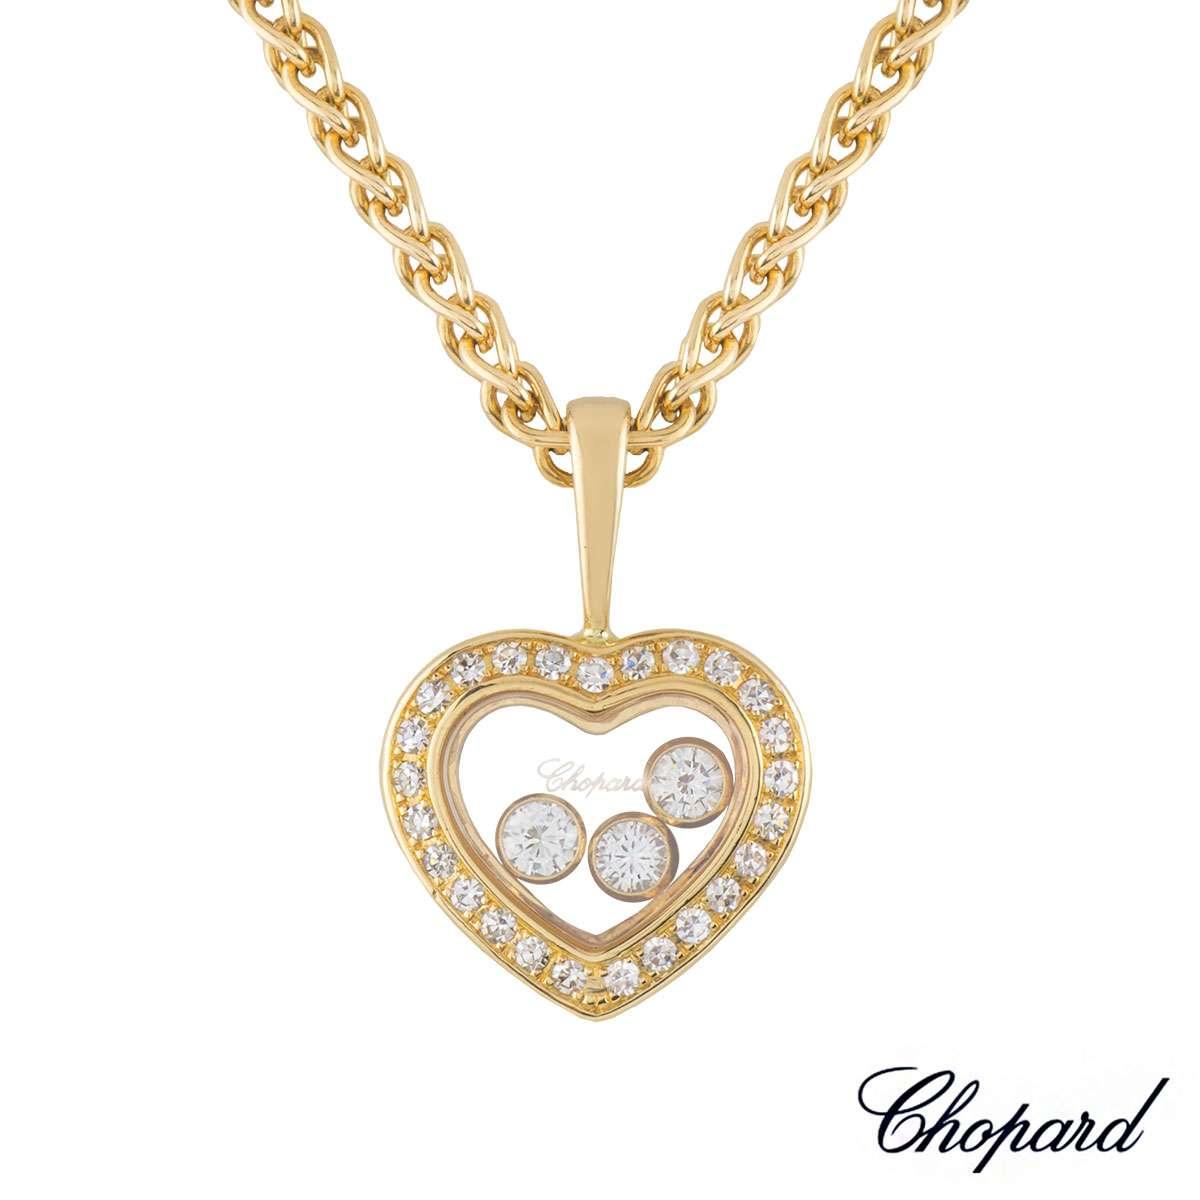 Chopard yellow gold happy diamonds pendant 799203 0003 rich chopard yellow gold happy diamonds pendant 799203 0003 aloadofball Gallery